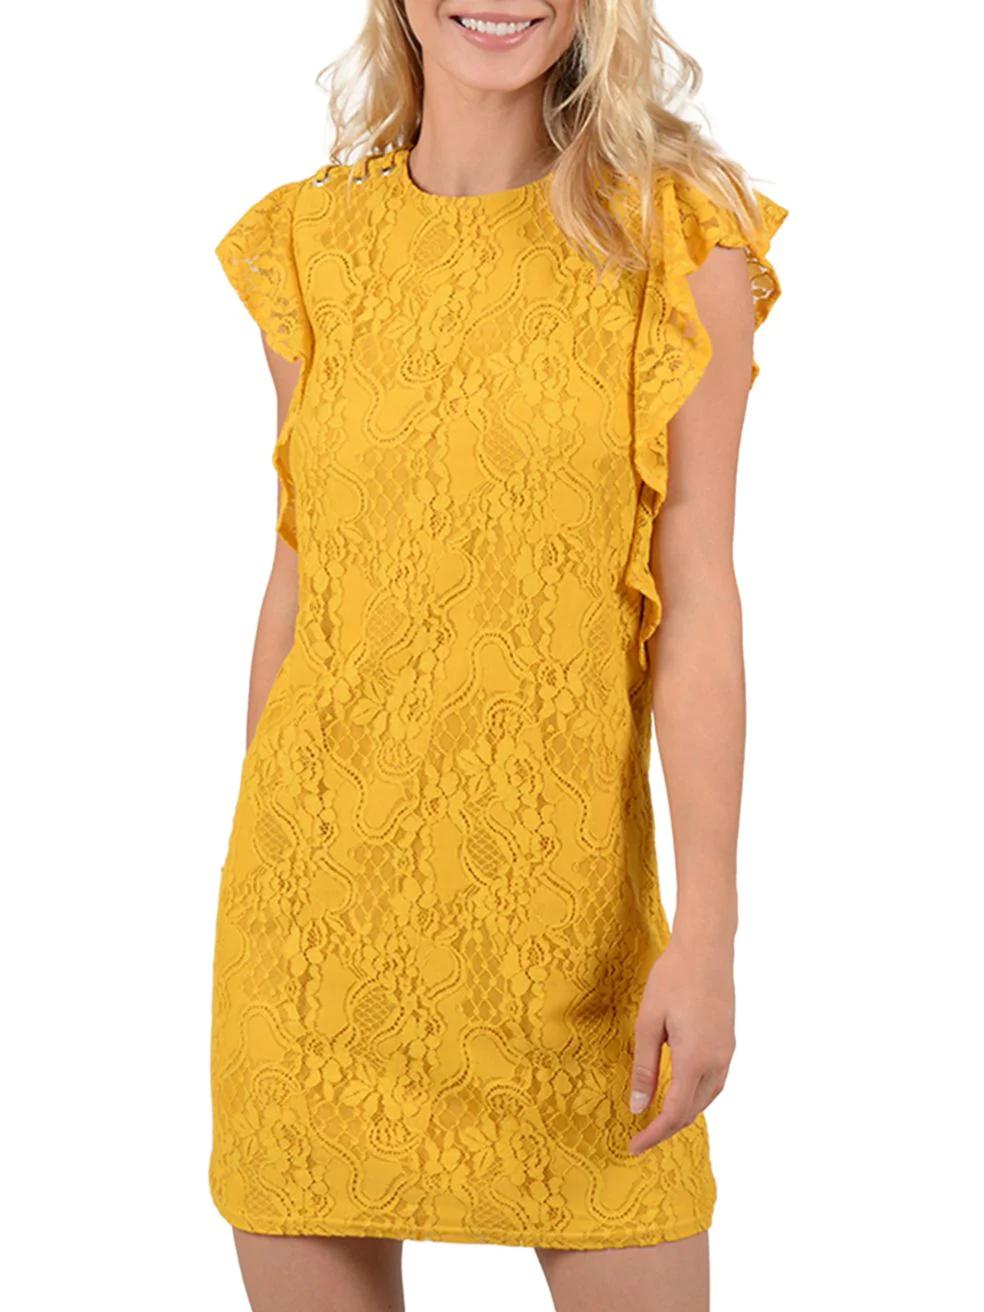 MOLLY BRACKEN. Ruffle lace shirt dress